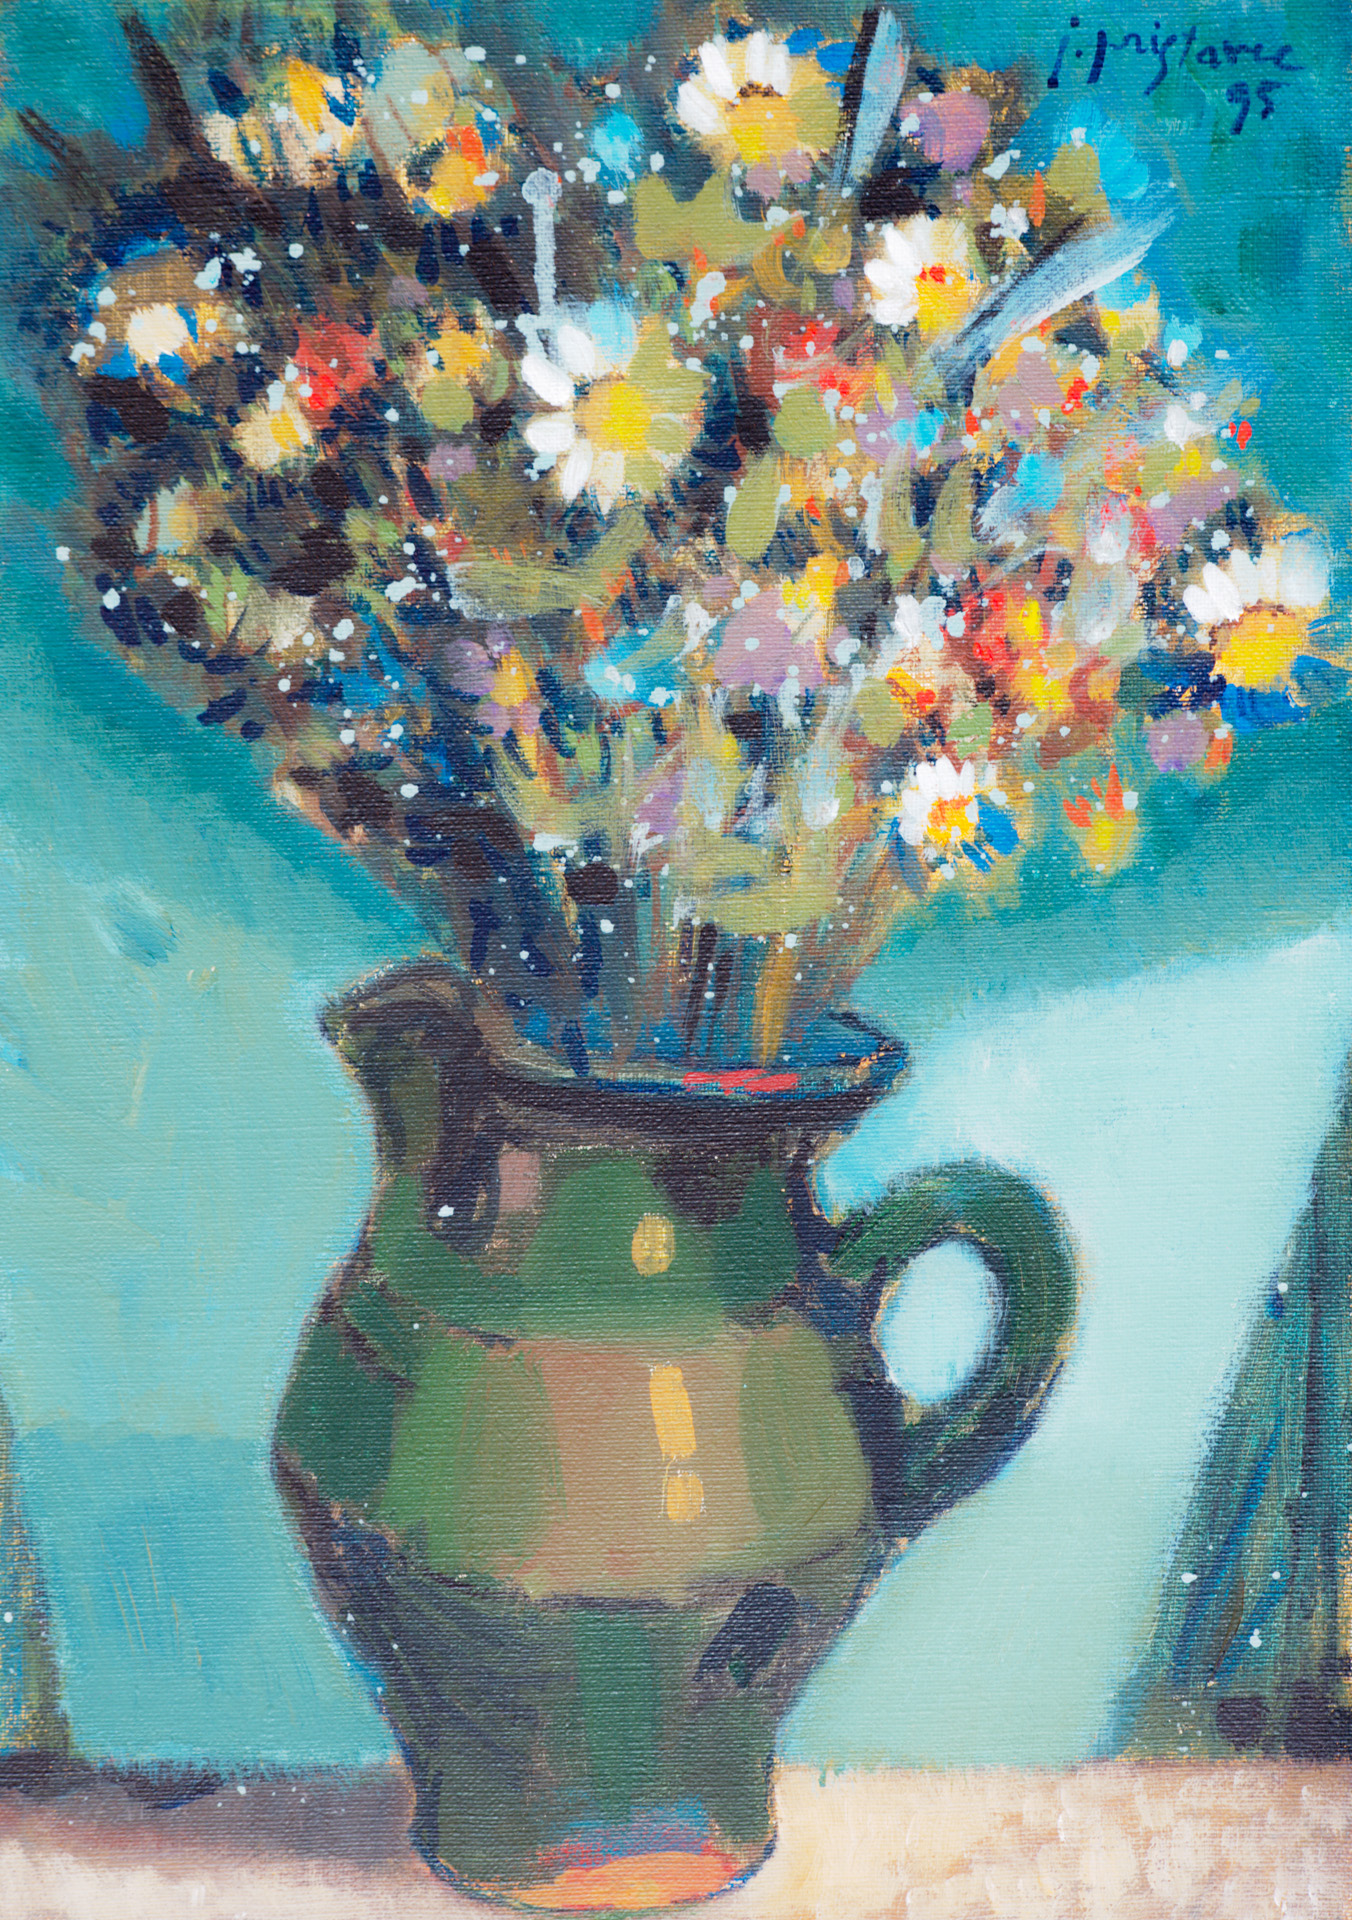 Still Life VIII / 1995 / oil on canvas / 35x50 cm